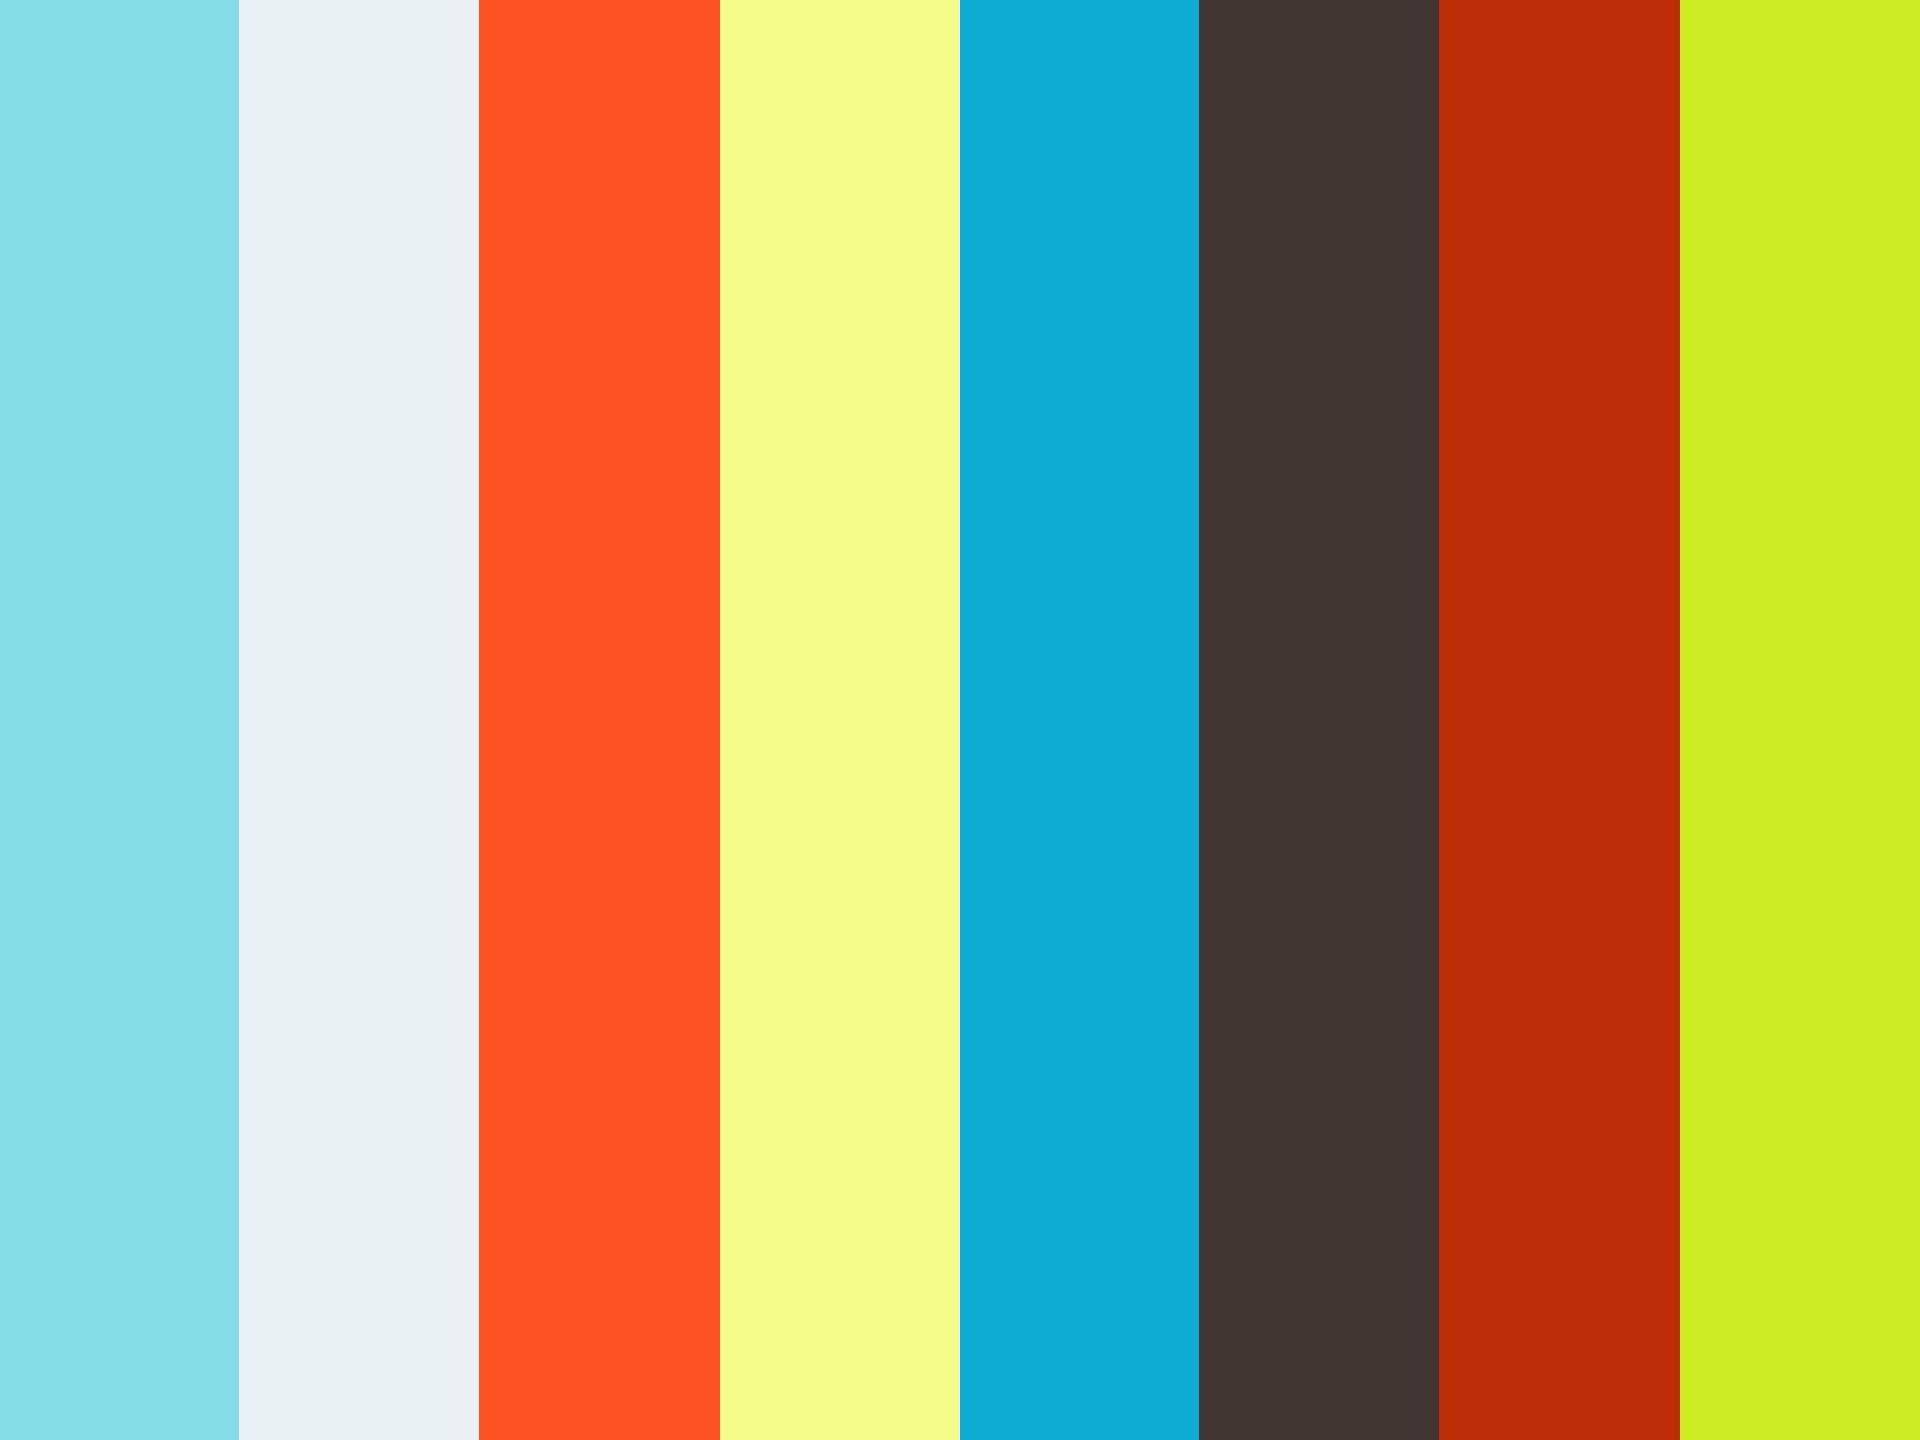 Rencontre Gay Valencienne! Rencontre Gay Valenciennes Fellation Rapide Chez Moi Ou Chez Toi